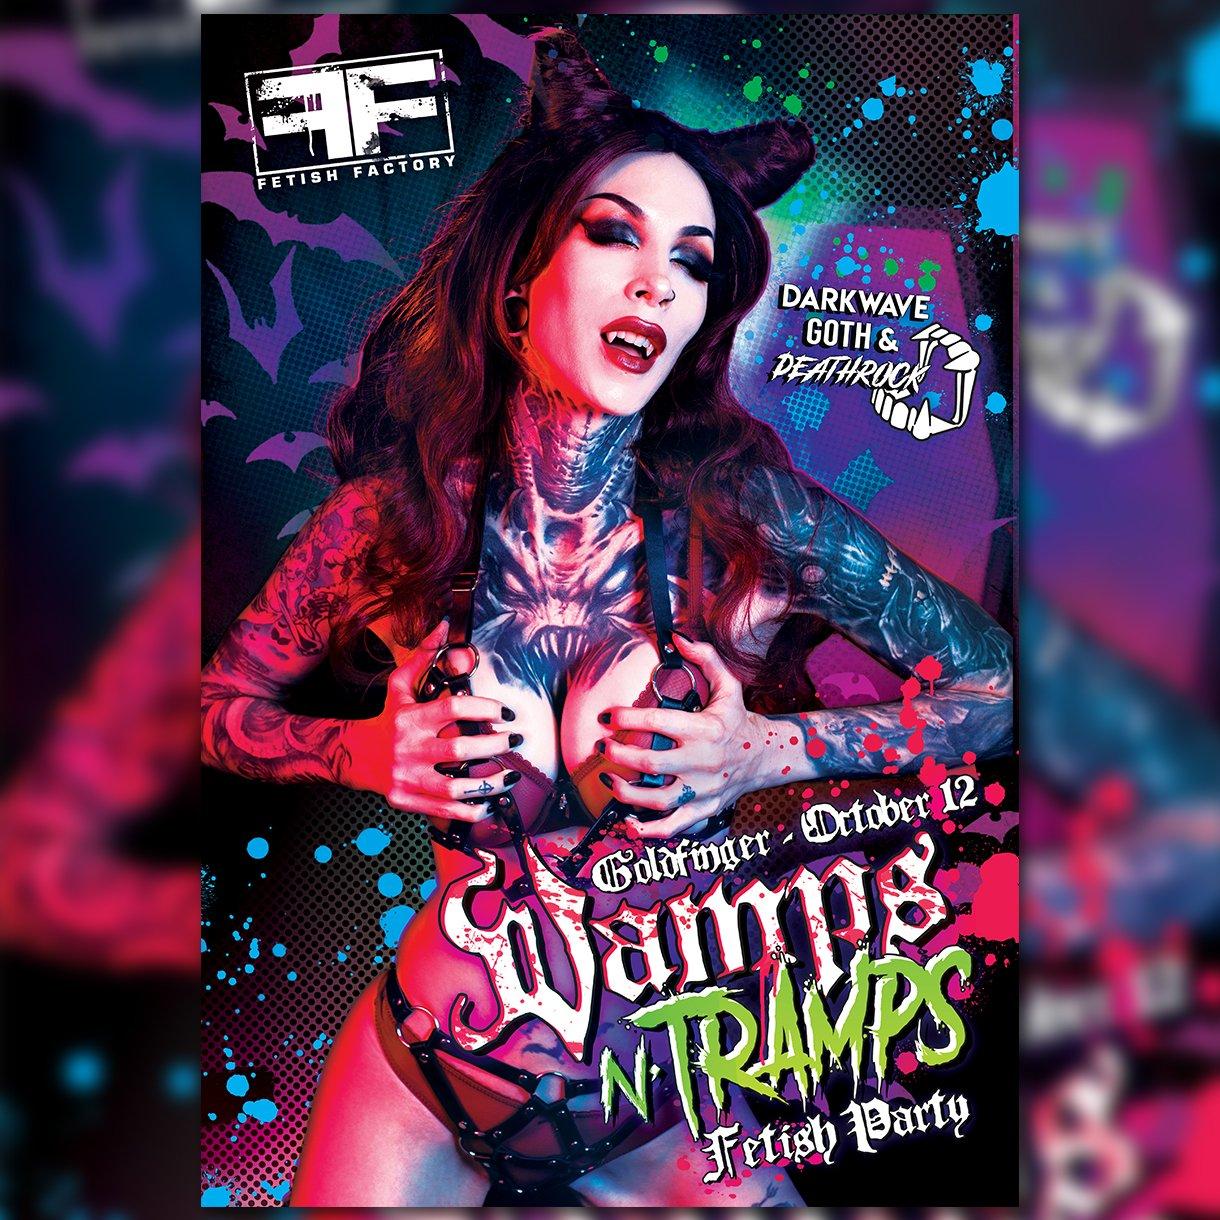 Vamps N Tramps Fetish Party - October 12, 2019